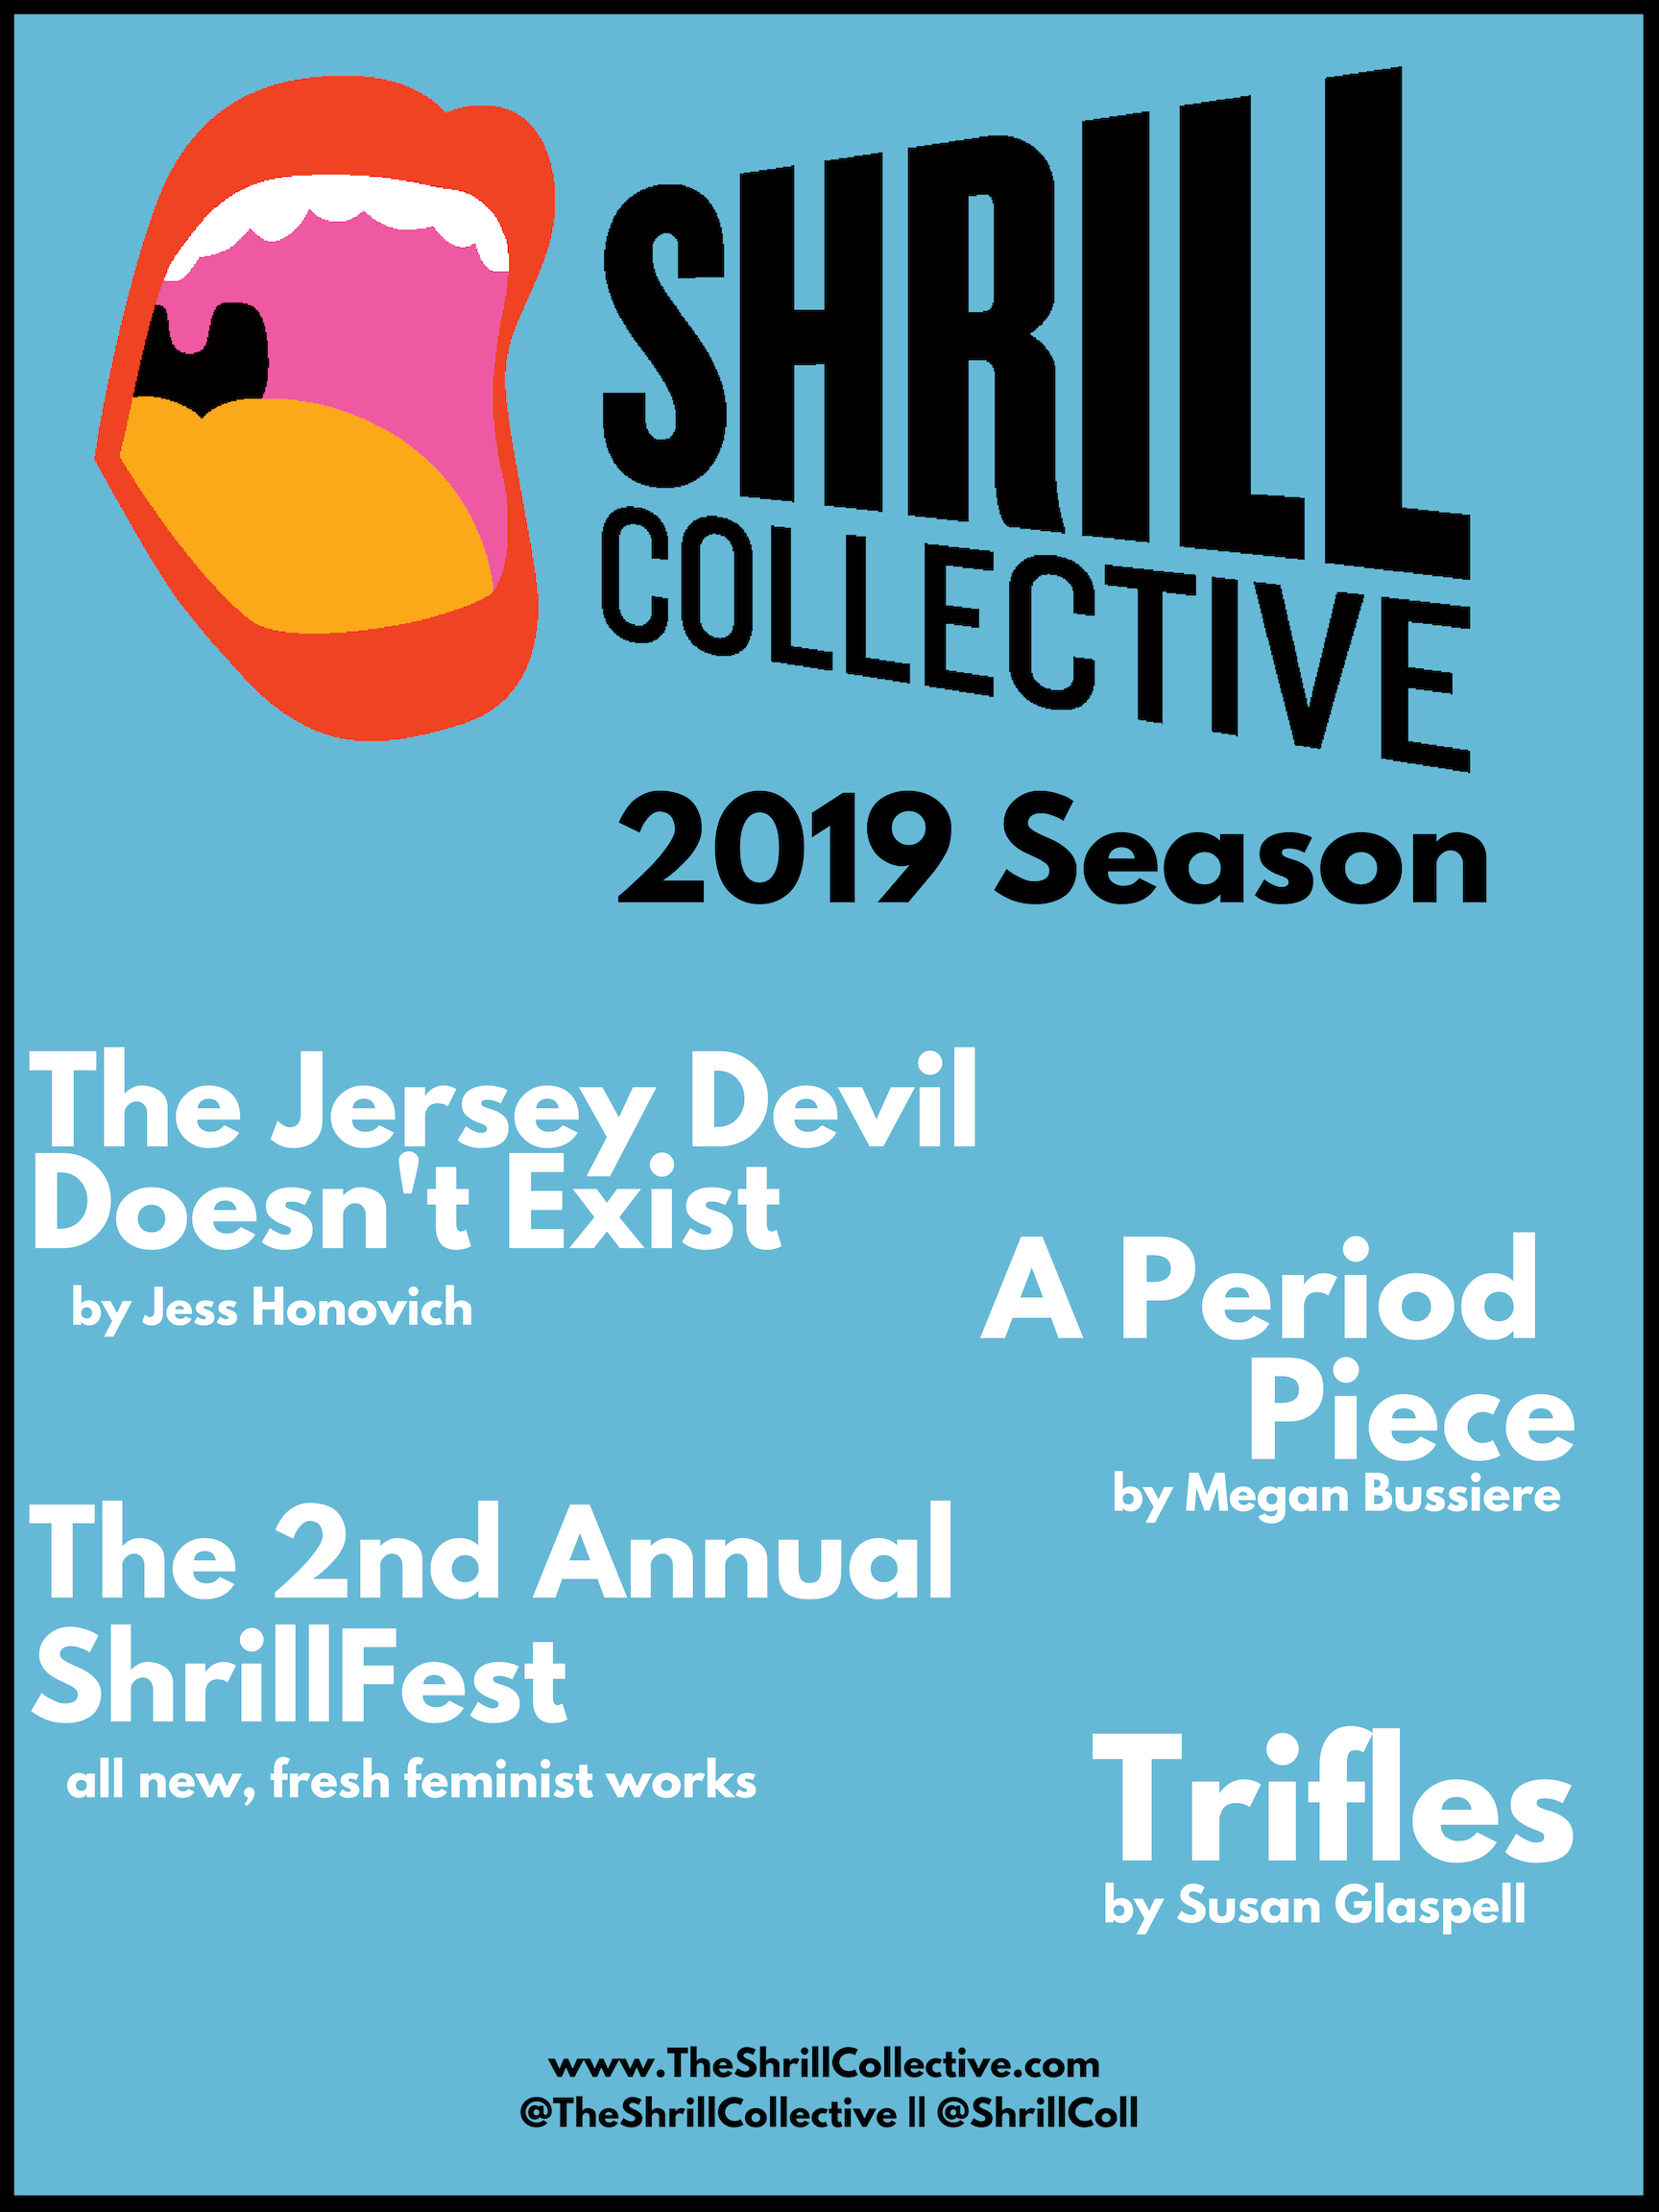 The Shrill collective 2019 season.jpg